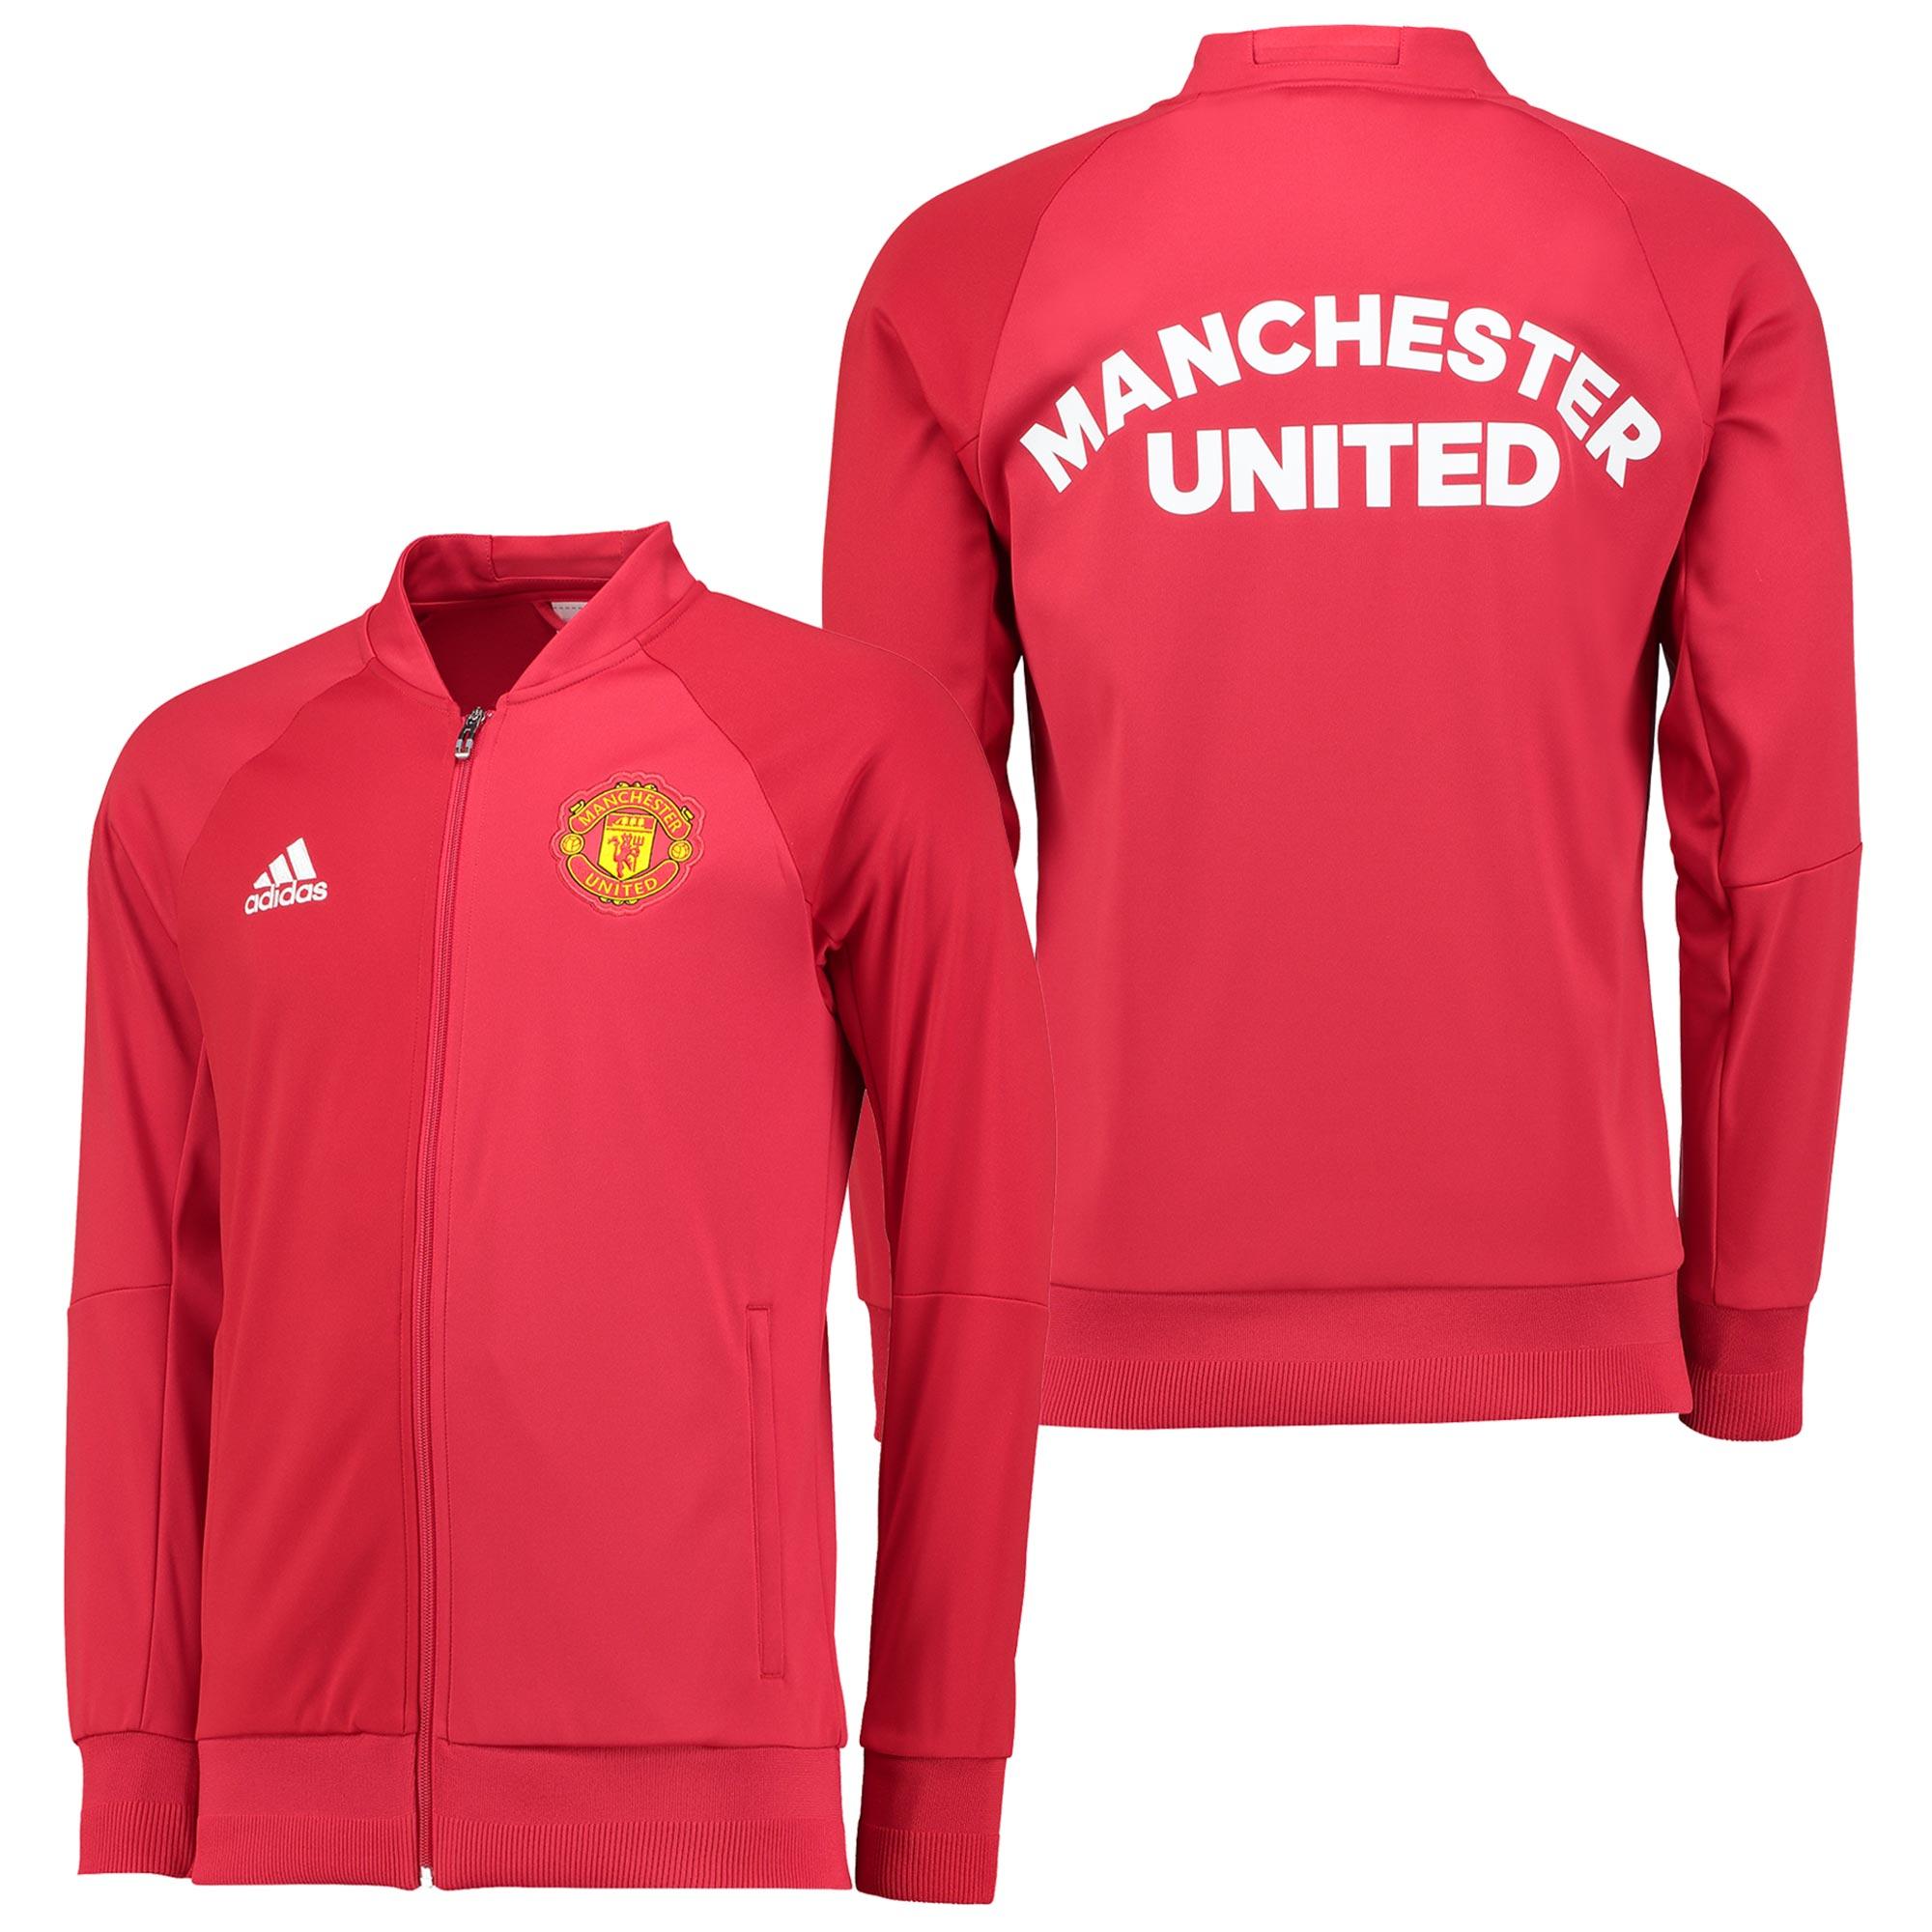 Manchester United Anthem Jacket - Red